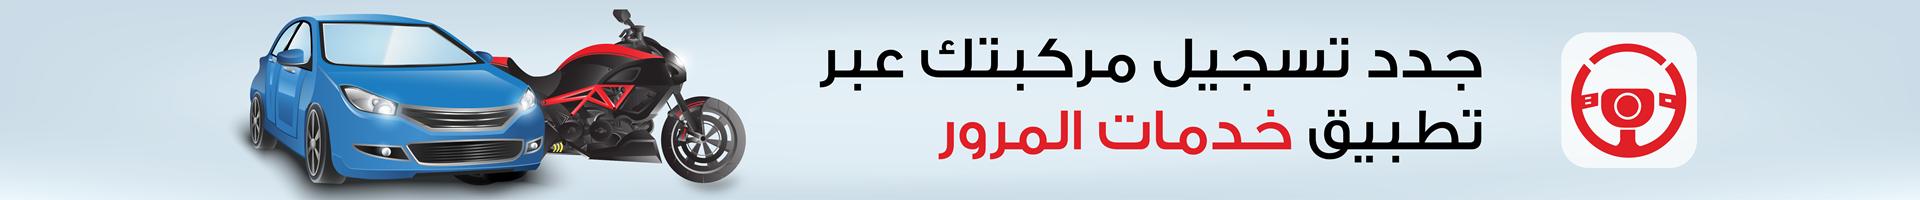 gigi takaful banner-01 (1)_ar